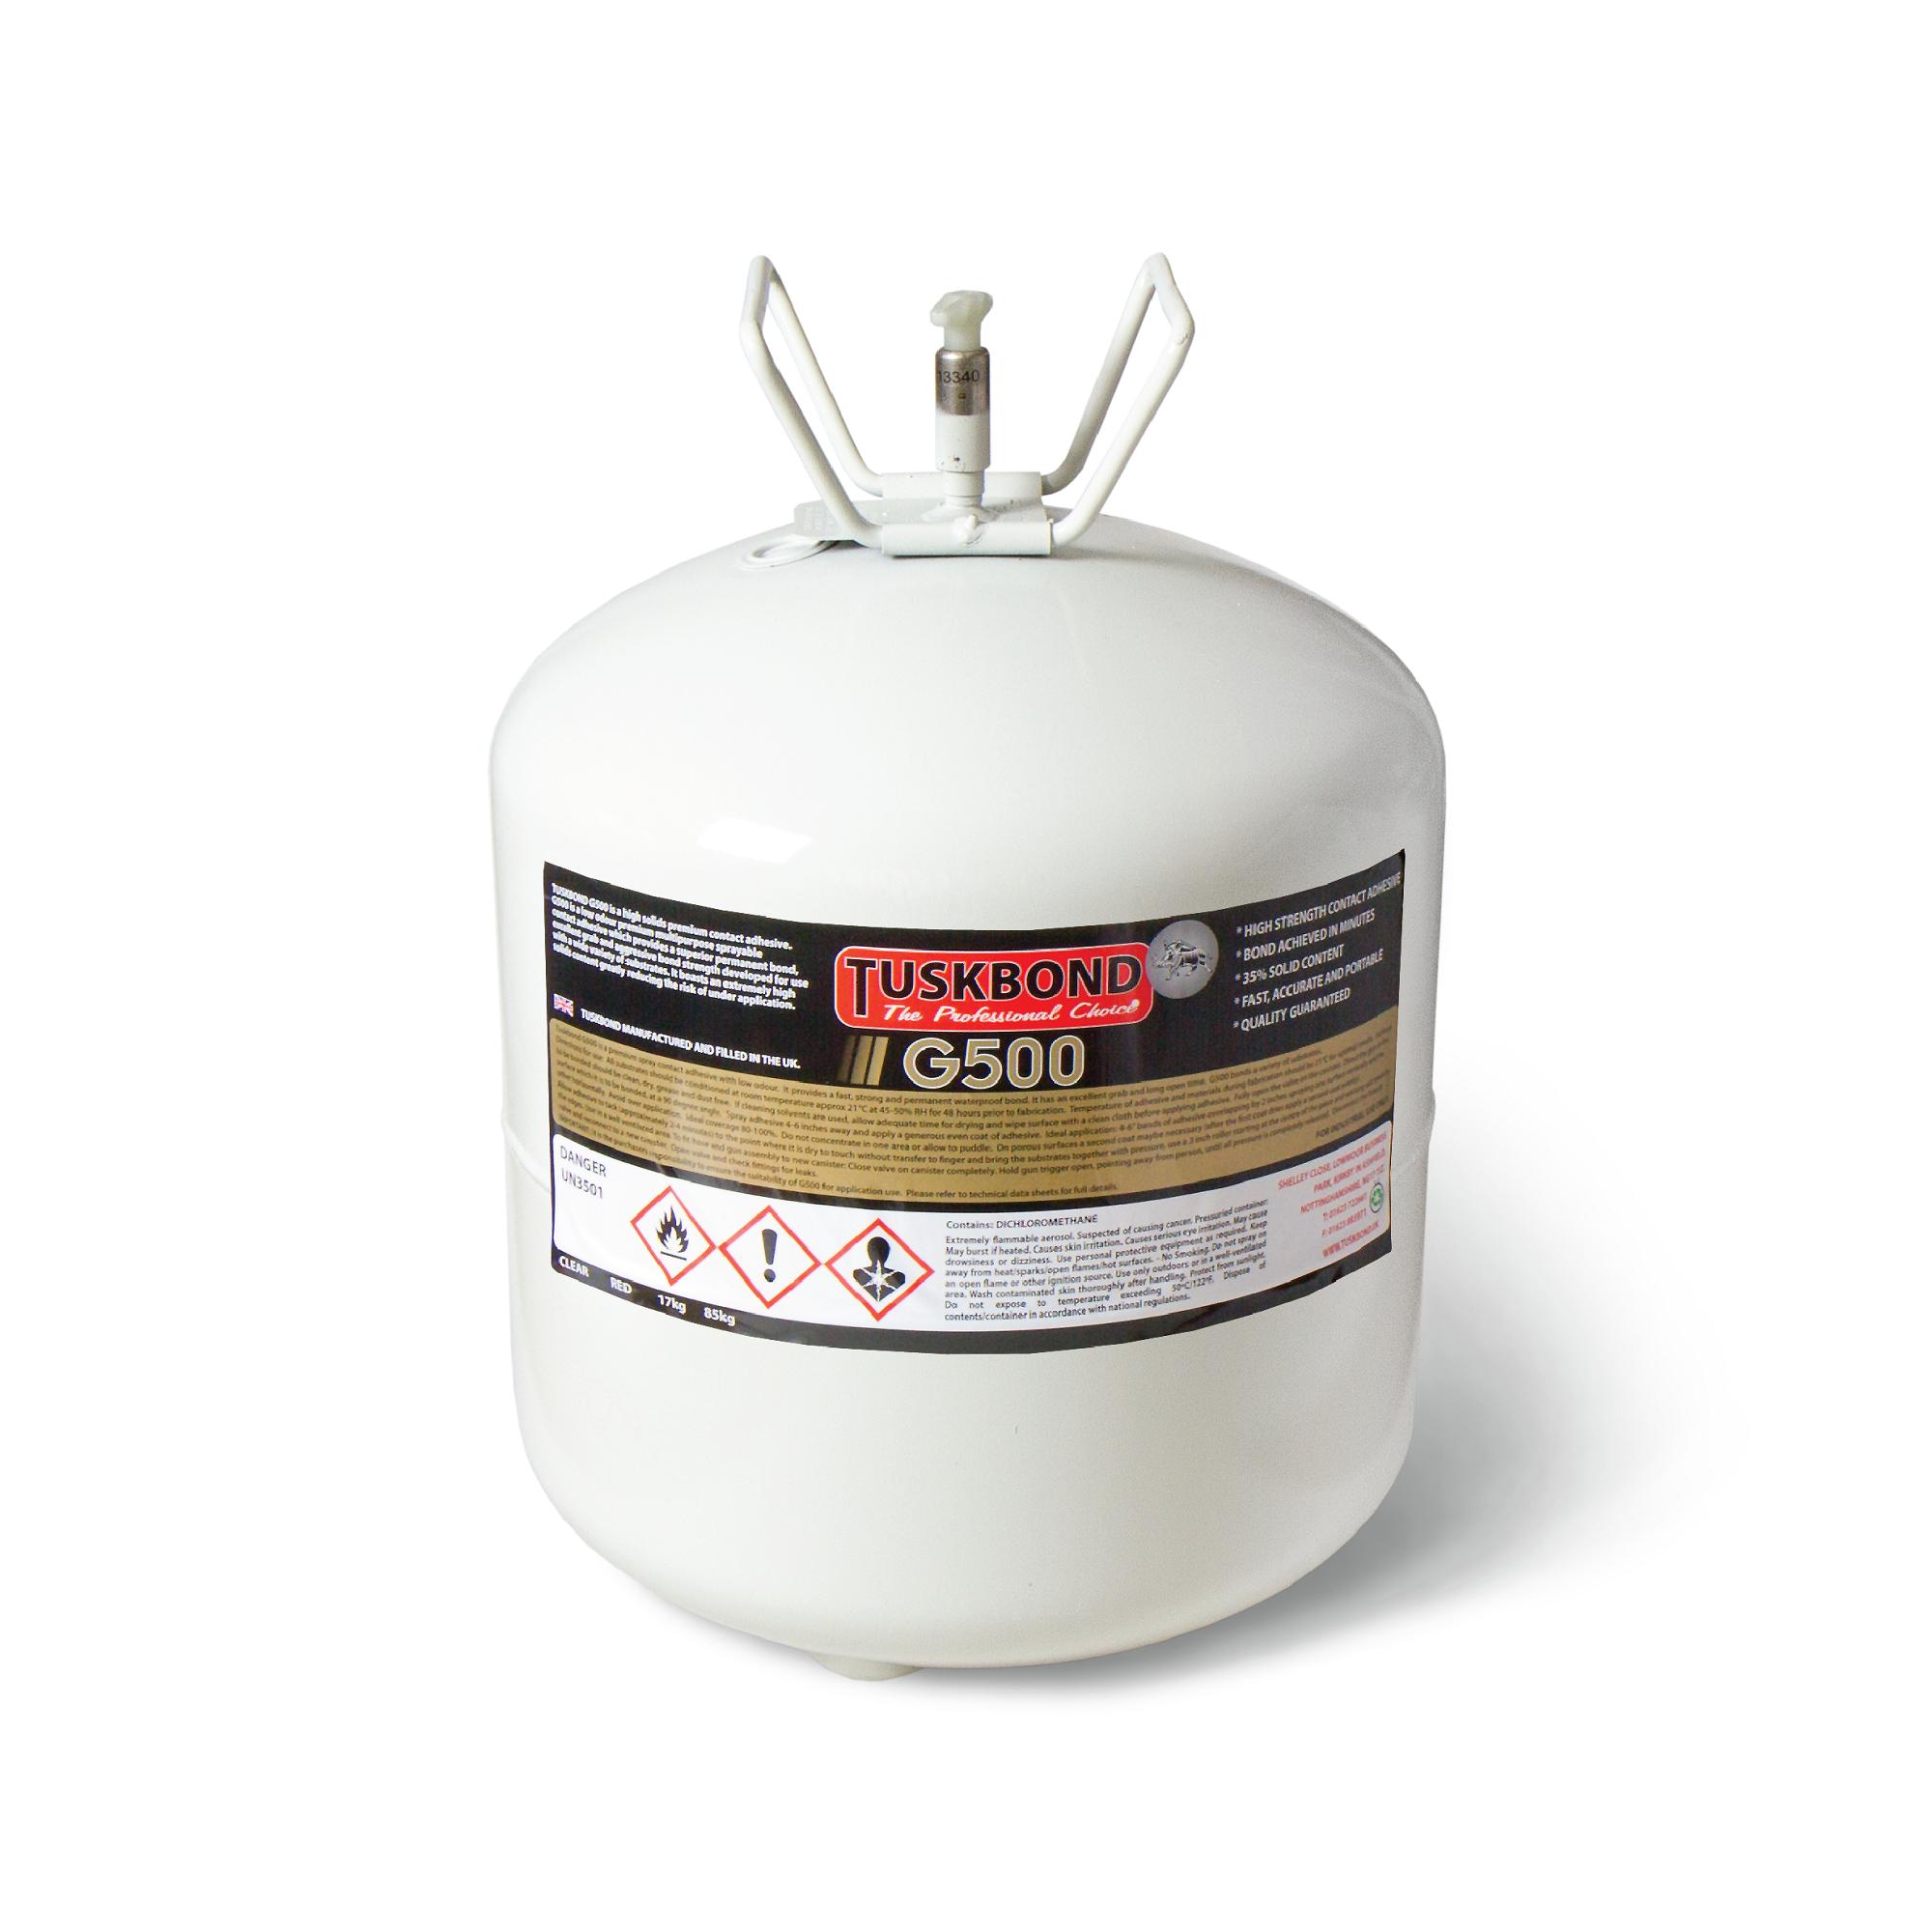 Tuskbond G500 Premium Contact Adhesive 17kg